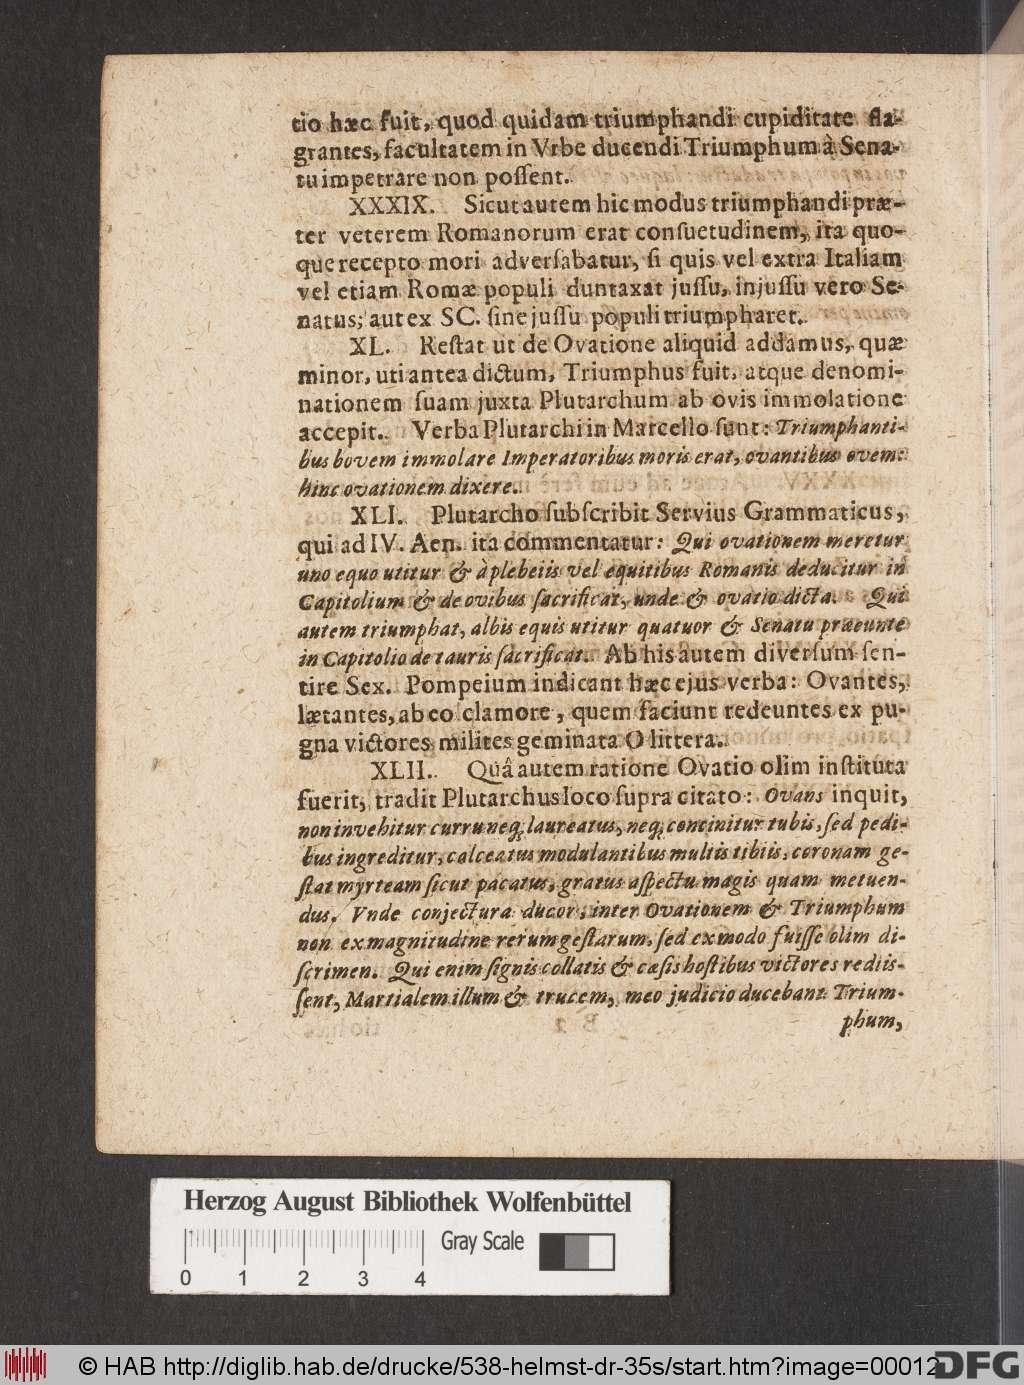 https://diglib.hab.de/drucke/538-helmst-dr-35s/00012.jpg